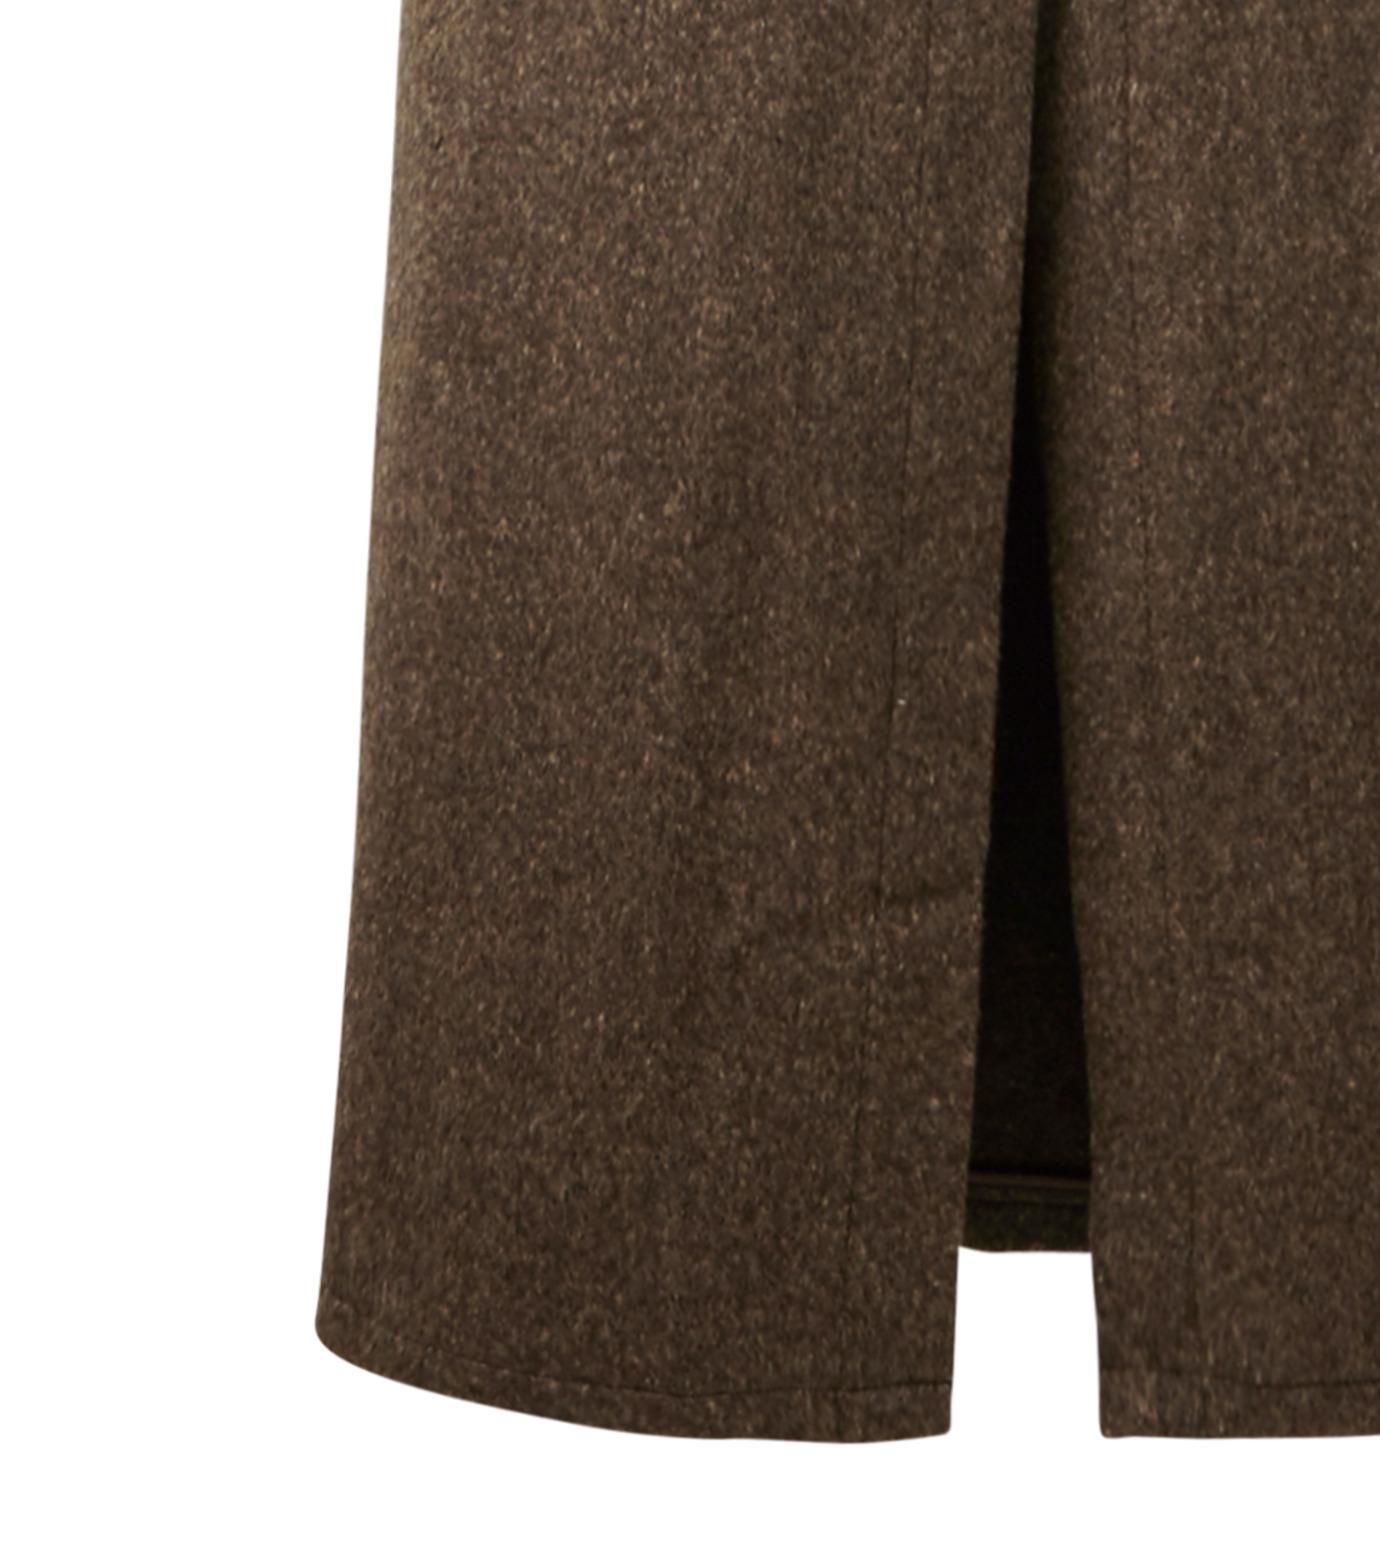 AKANE UTSUNOMIYA(アカネウツノミヤ)のNep Long Shirt Dress-DARK BROWN(ワンピース/one piece)-W16FT513008-43 拡大詳細画像4